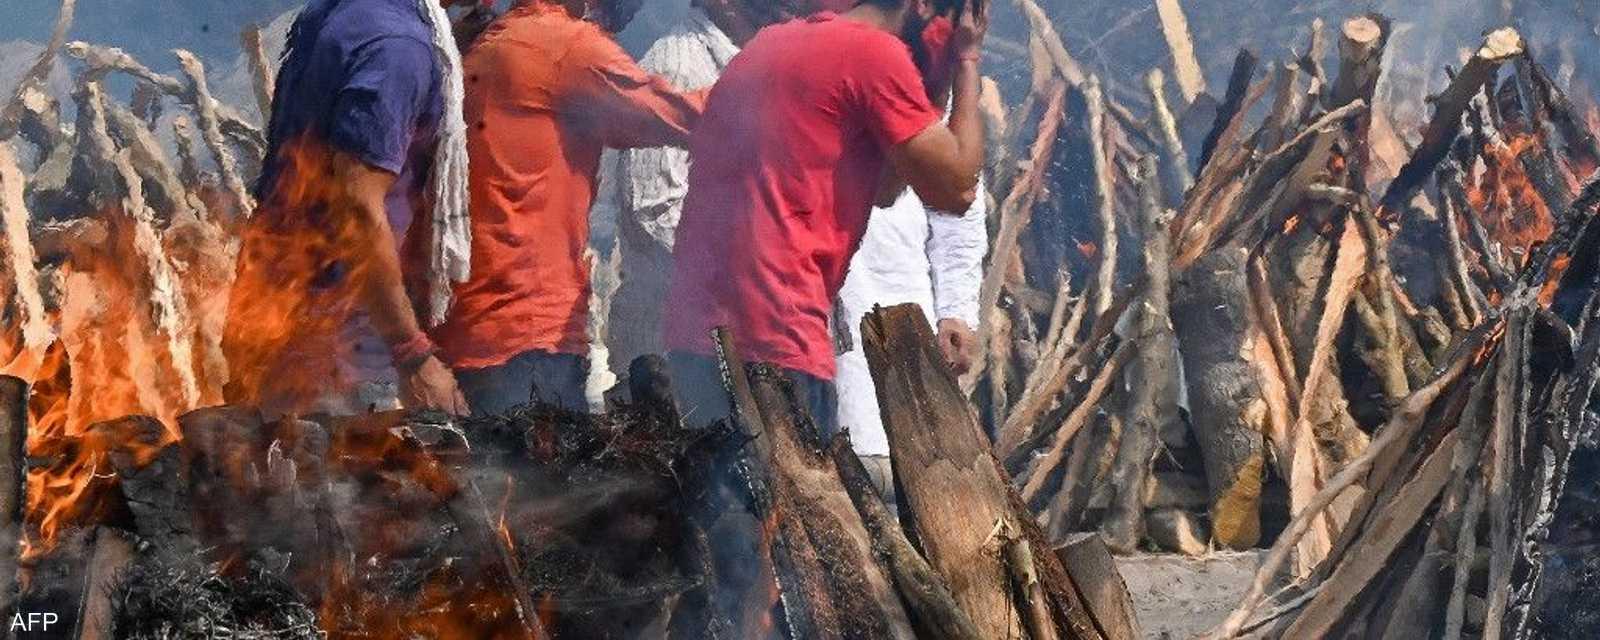 حزن ونيران عند حرق ضحايا كورونا